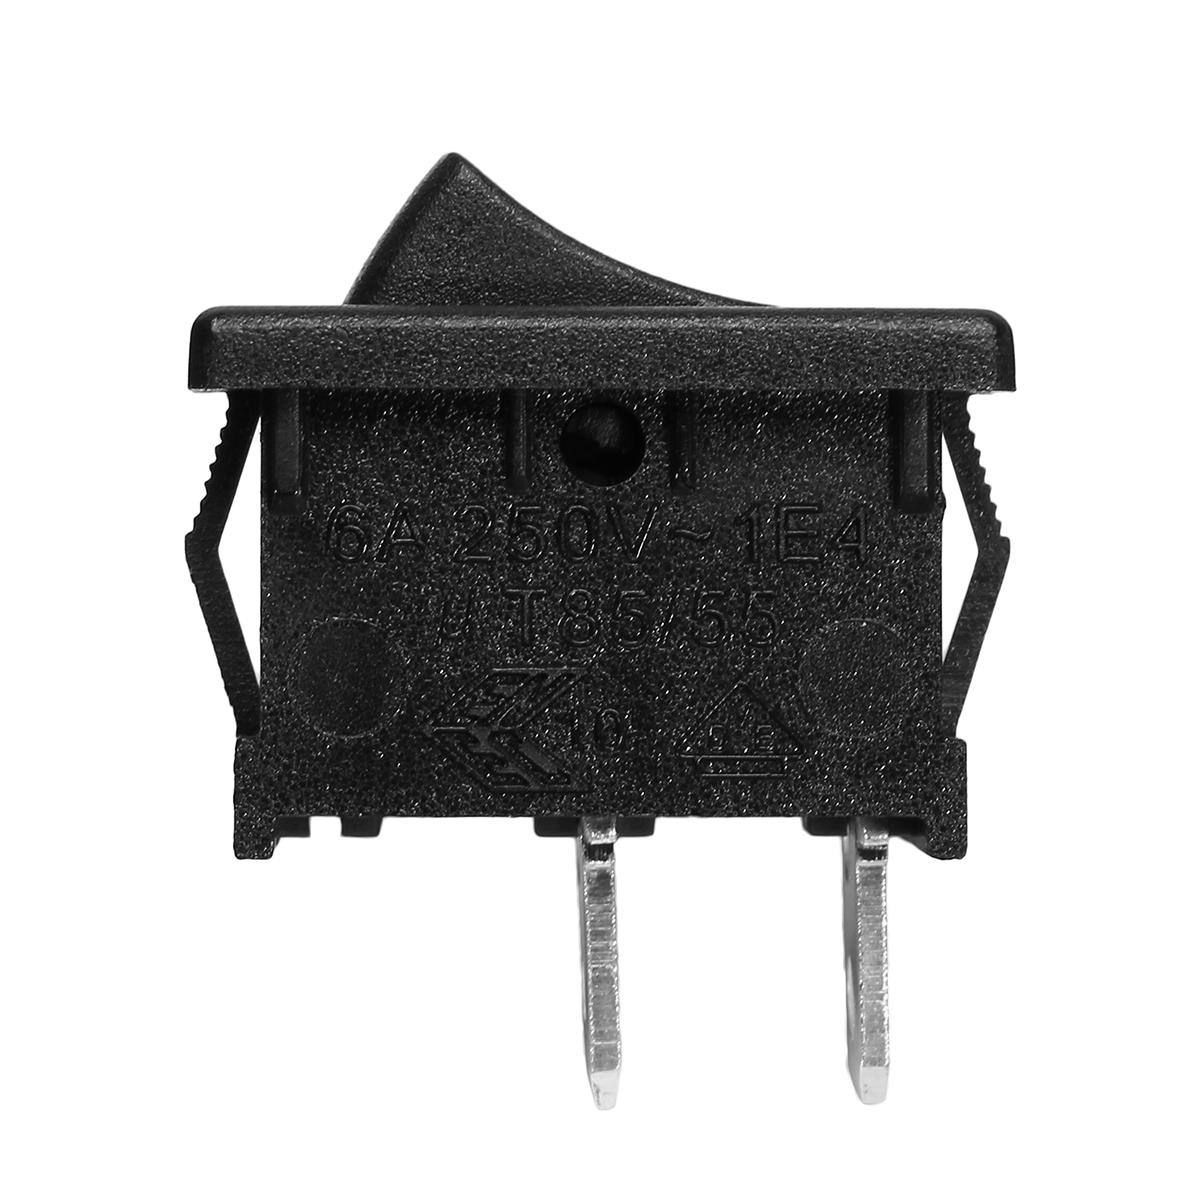 250V 6A 2Pin Mini Rocker Switch With Dot Mini Power Switch ON-OFF